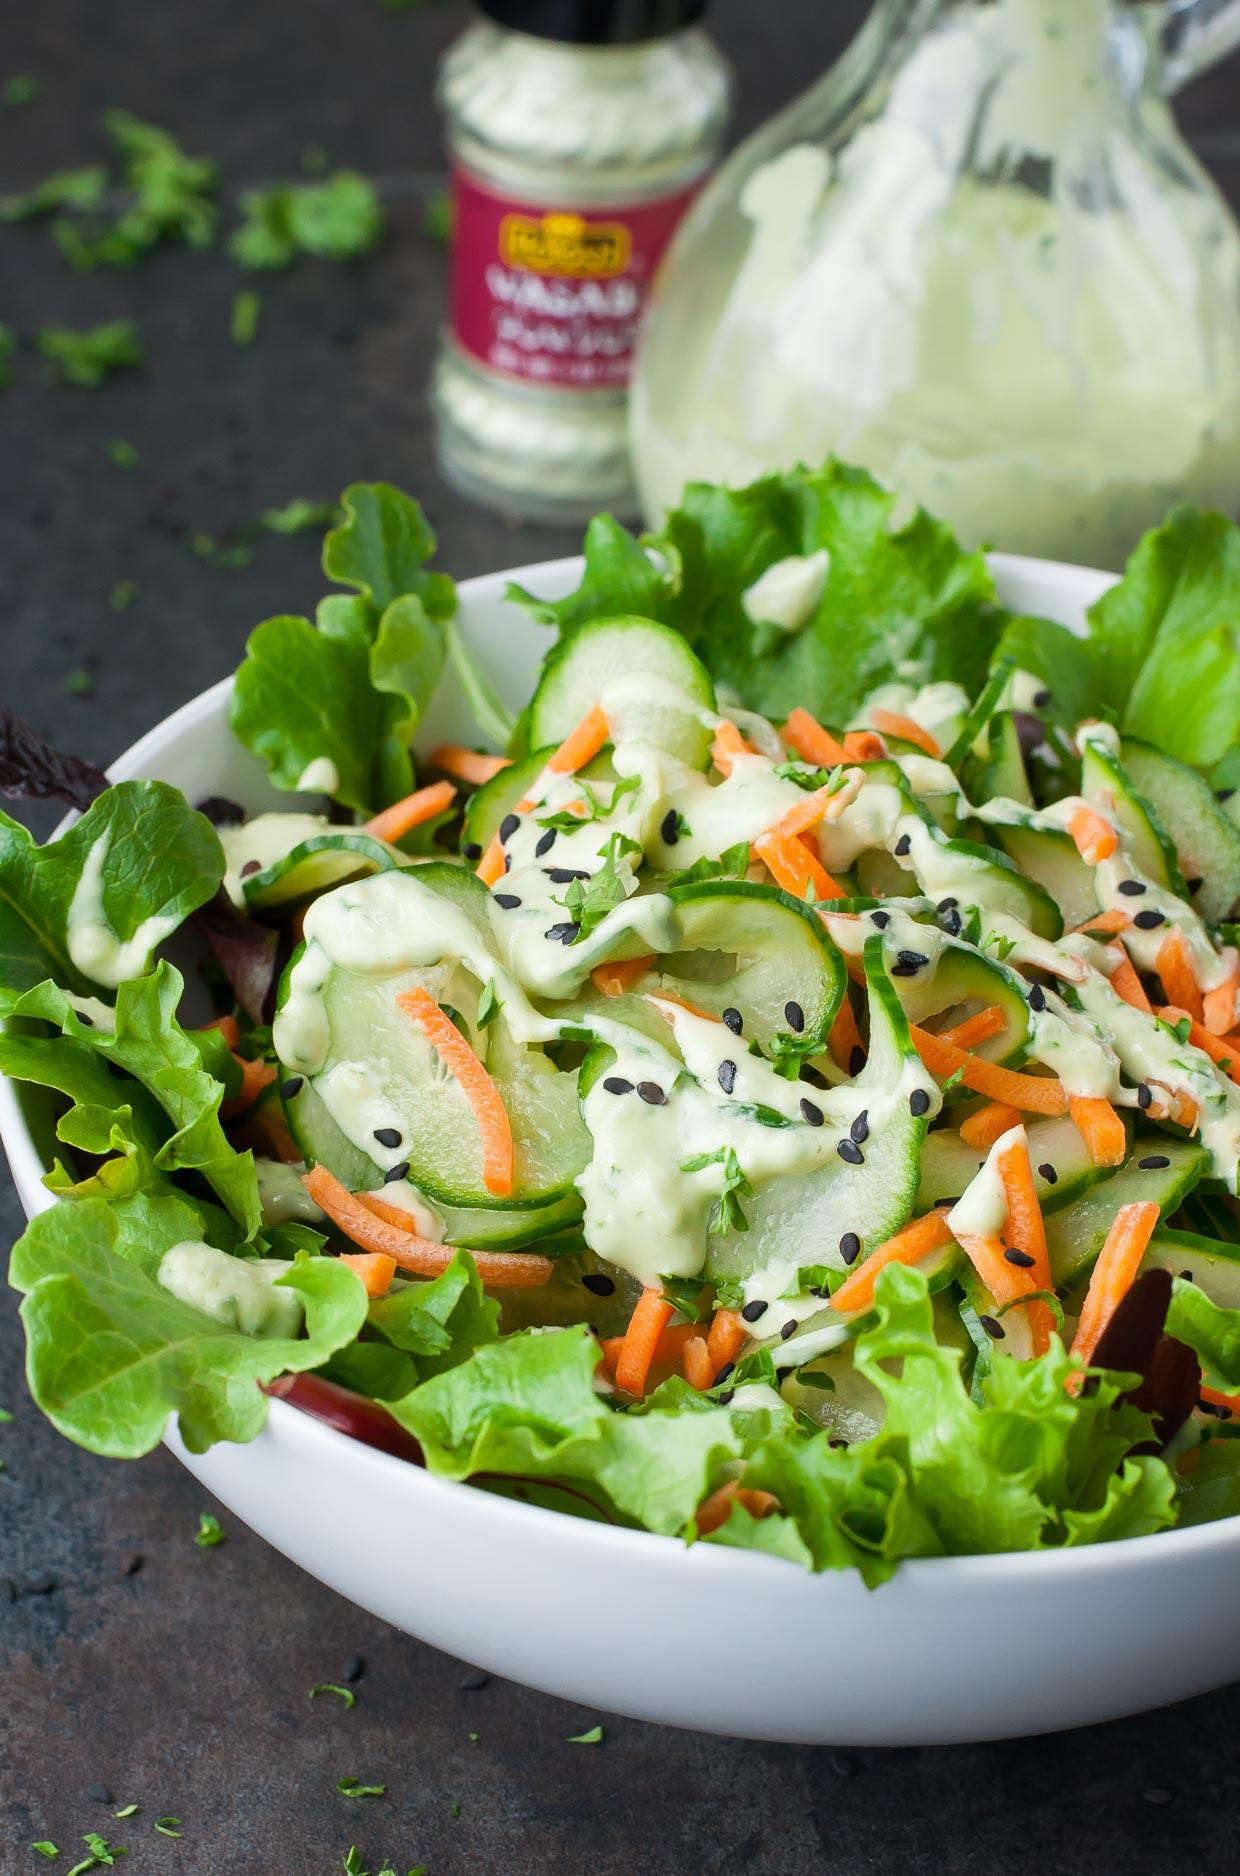 Wasabi salad dressing